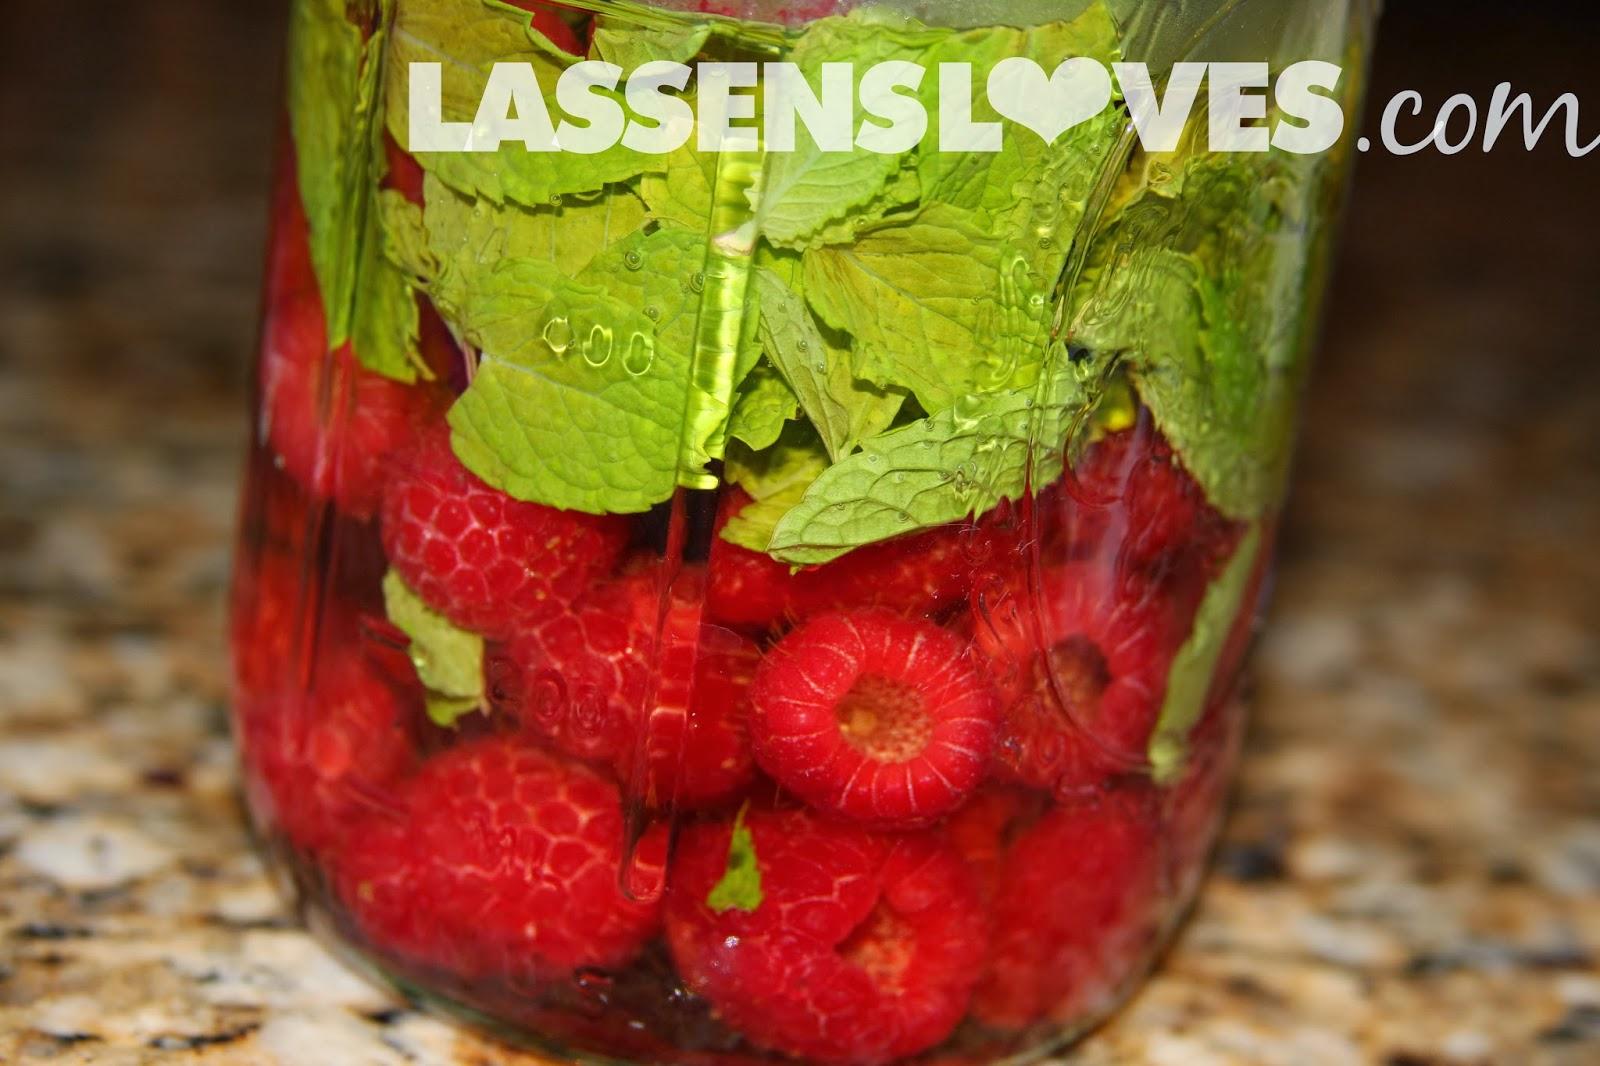 lassensloves.com, Lassen's, Lassens, Flavored+Vinegars